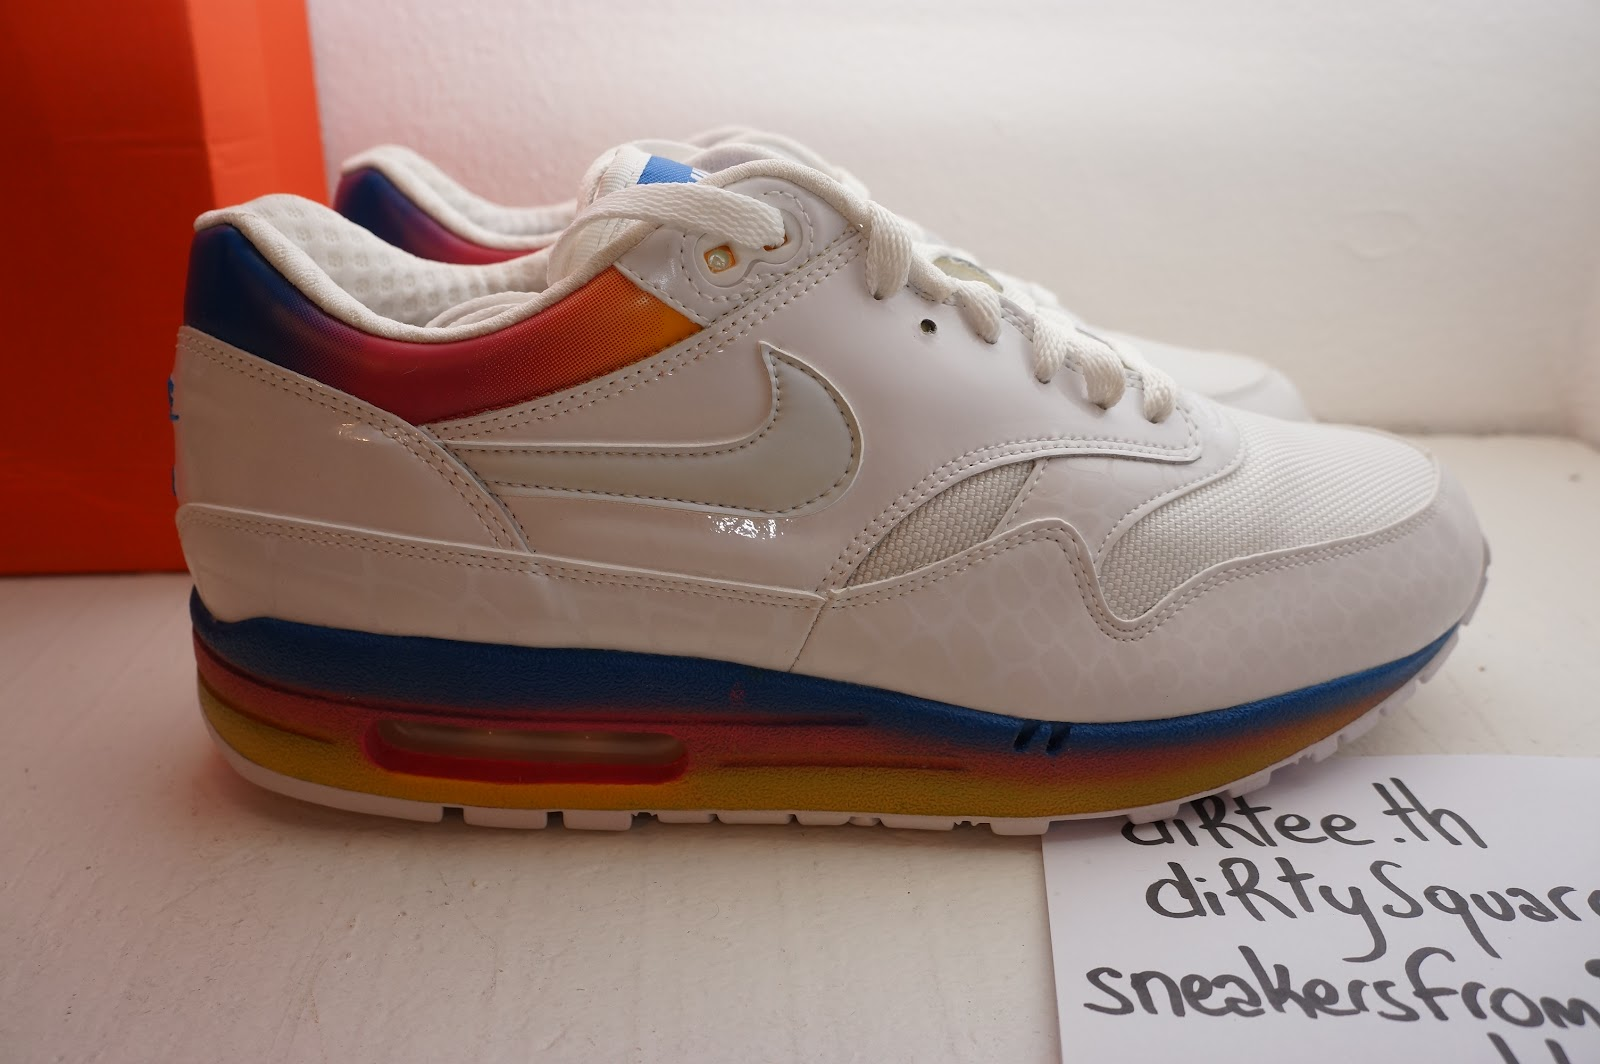 Nike Air Jordan Retro 8 Aqua Courir De Mardi